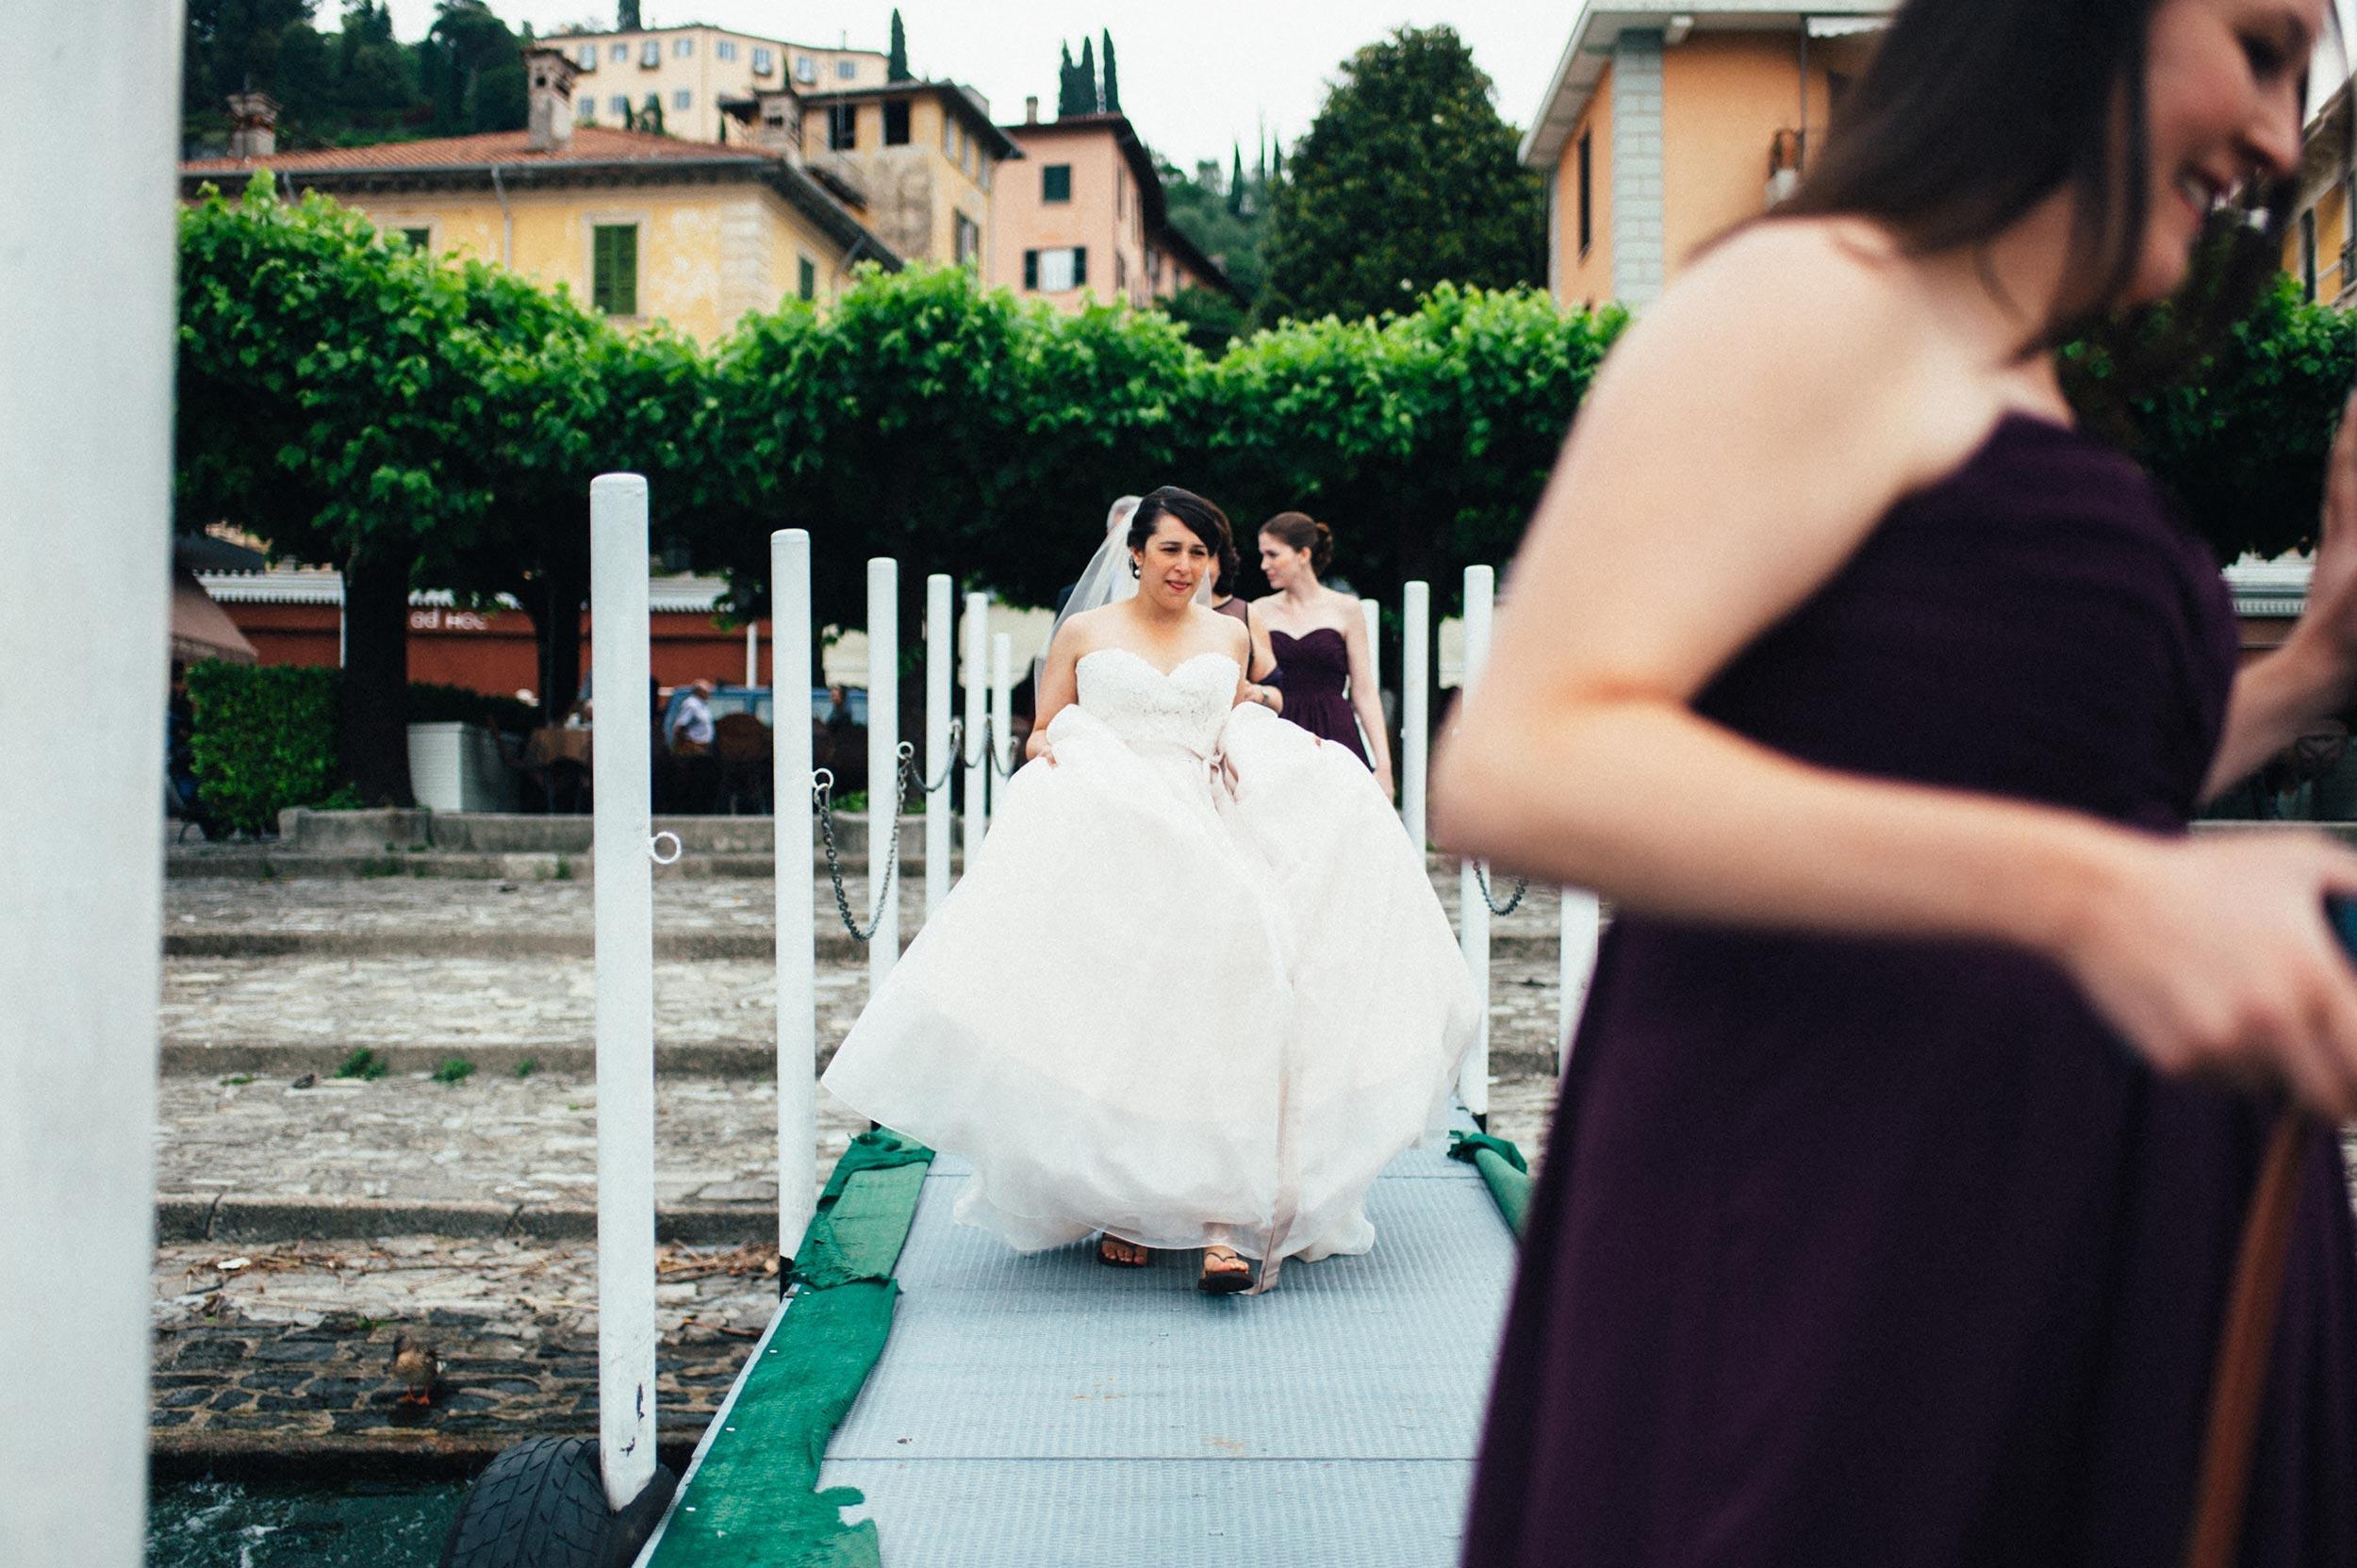 2015-Jon-Lauren-Bellagio-Lake-Como-Wedding-Photographer-Italy-Alessandro-Avenali-14.jpg